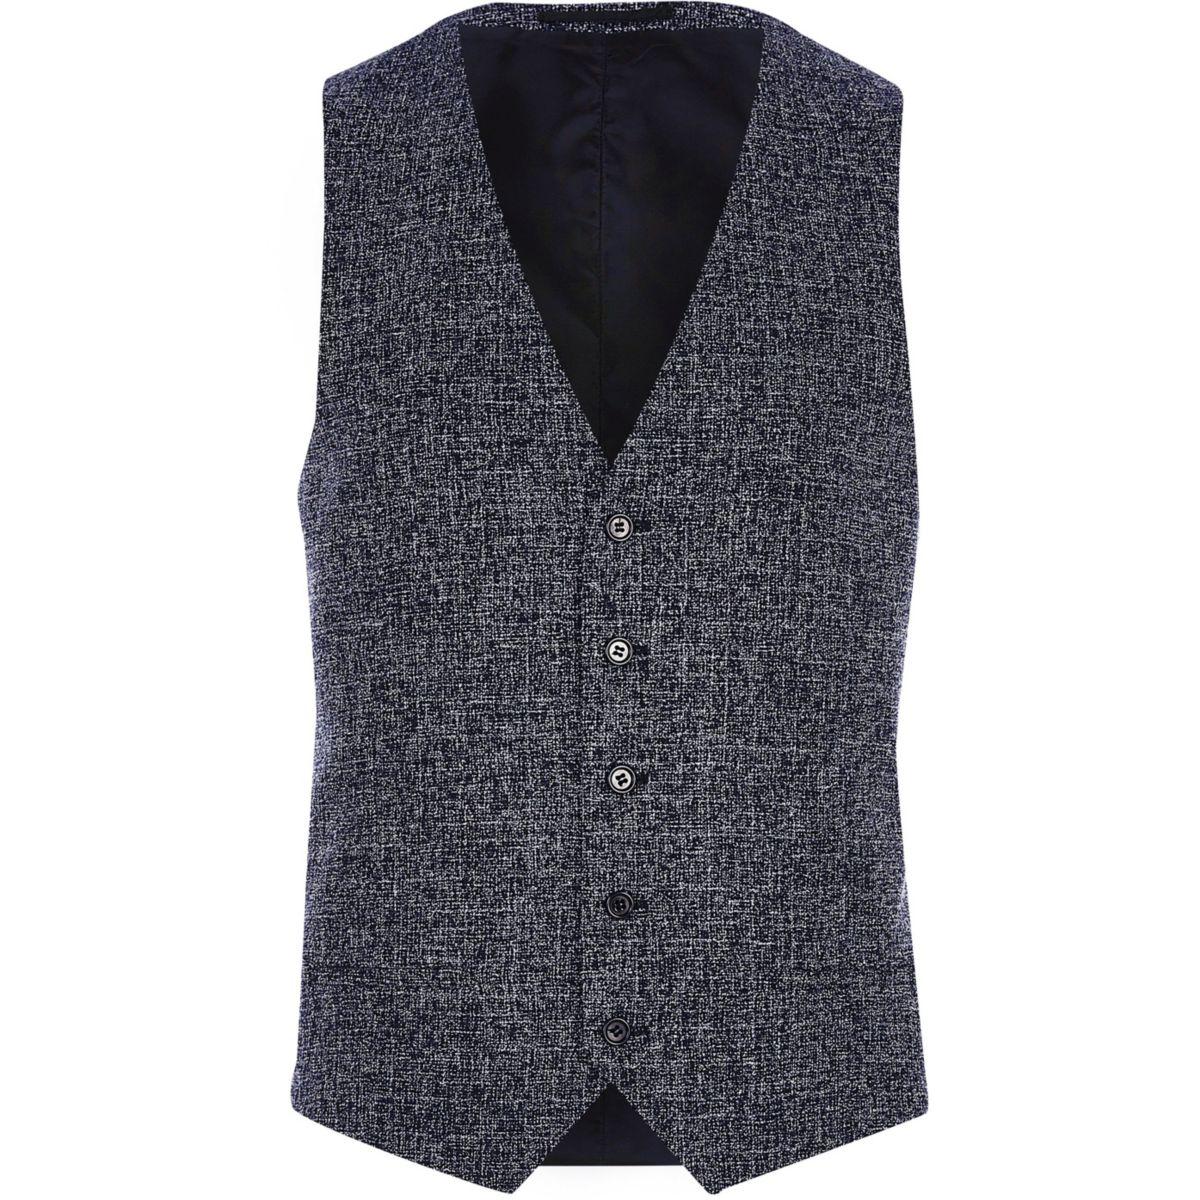 Navy blue textured vest